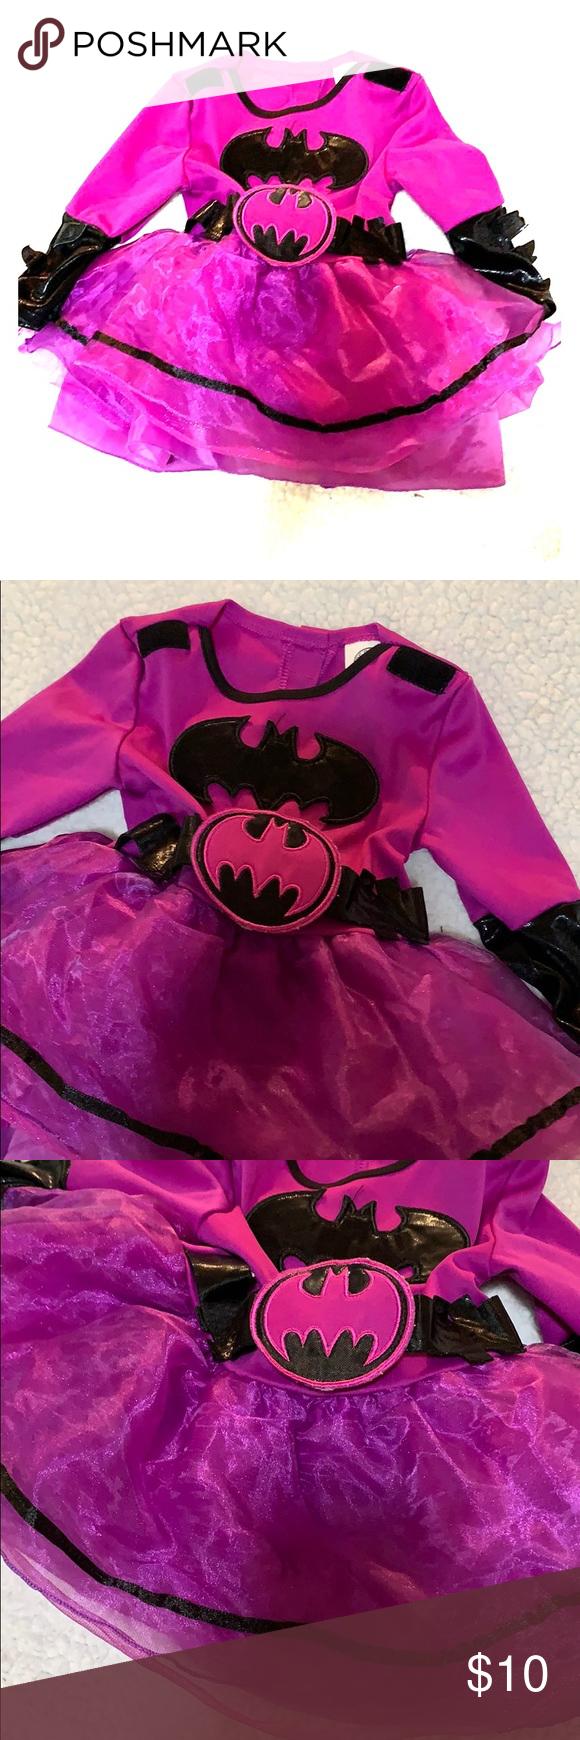 Infant Purple Batman Halloween costume Sz 6-12m Cute Purple Batman costume with a tutu skirt for infants aged/sized 6-12 months    **Missing cape** Costumes Halloween #halloweencostumesforinfants Infant Purple Batman Halloween costume Sz 6-12m Cute Purple Batman costume with a tutu skirt for infants aged/sized 6-12 months    **Missing cape** Costumes Halloween #halloweencostumesforinfants